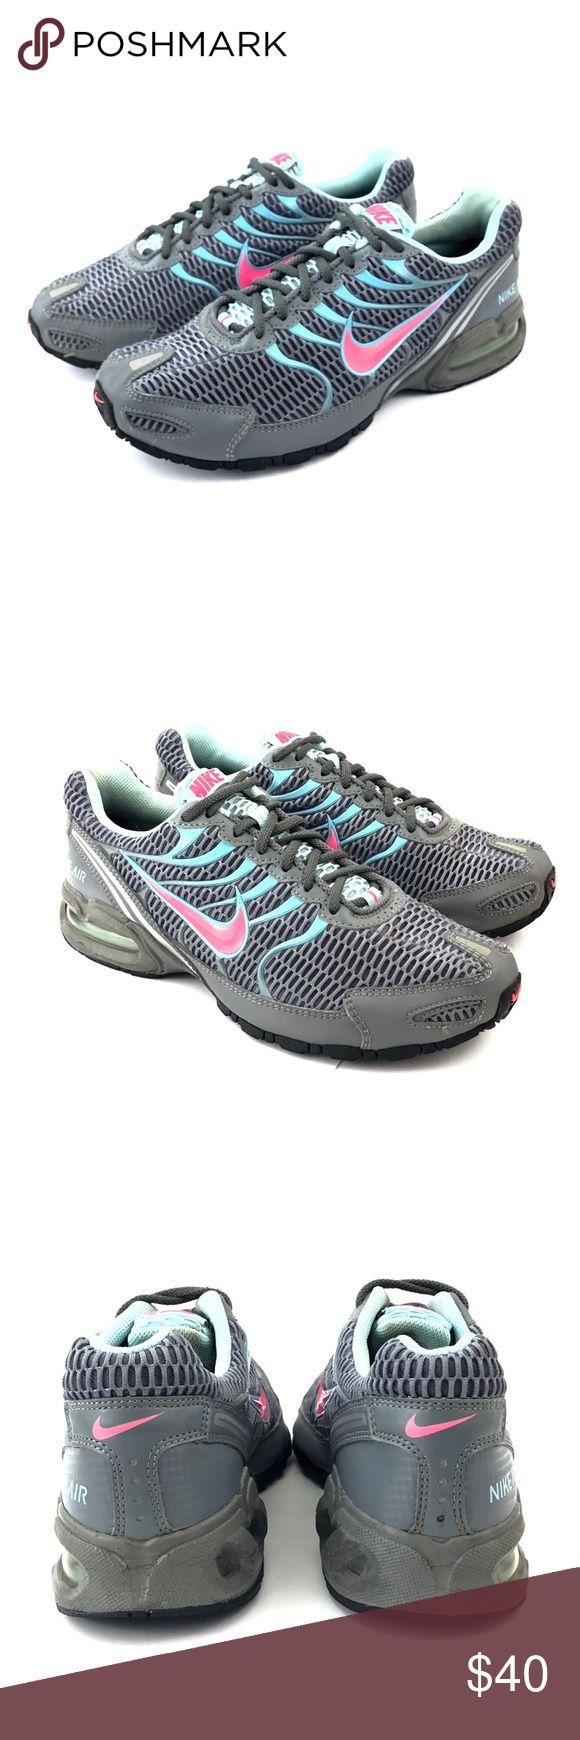 Nike Air Max Torch 4 Women's Shoes Size 9 Teal Nike air